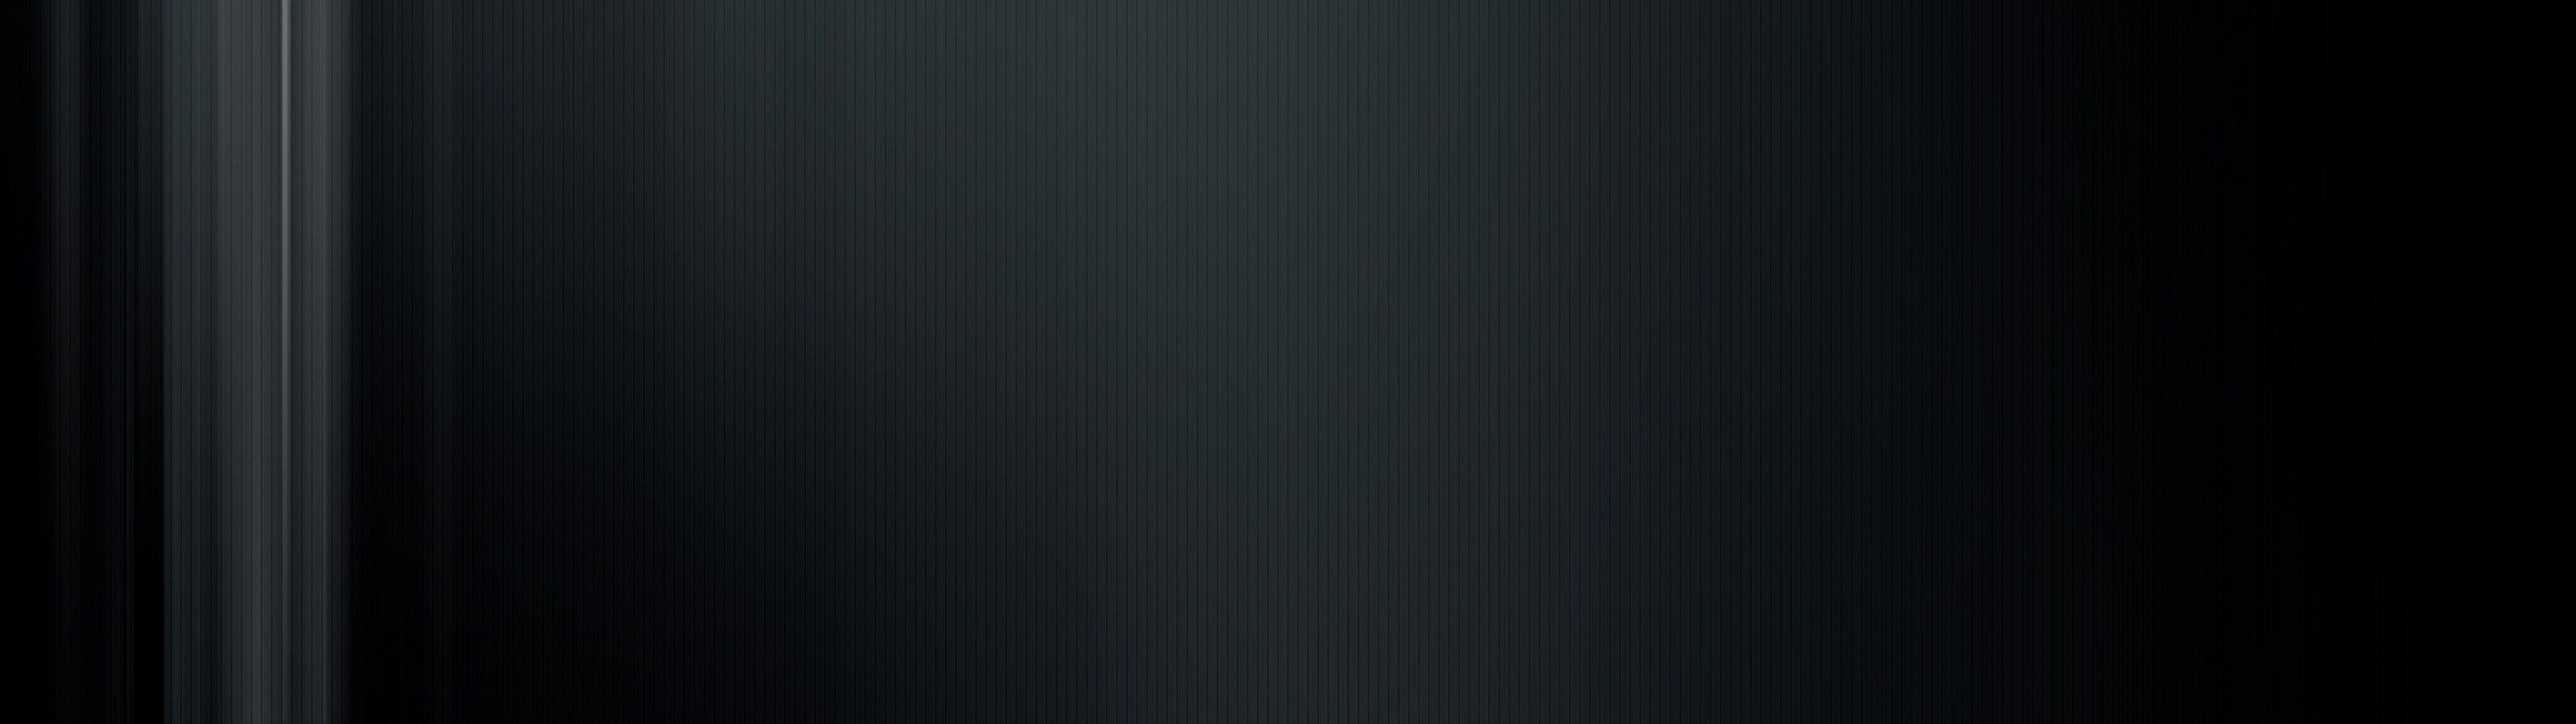 Dual screen wallpaper 3840x1080 HQ WALLPAPER   25997 3840x1080